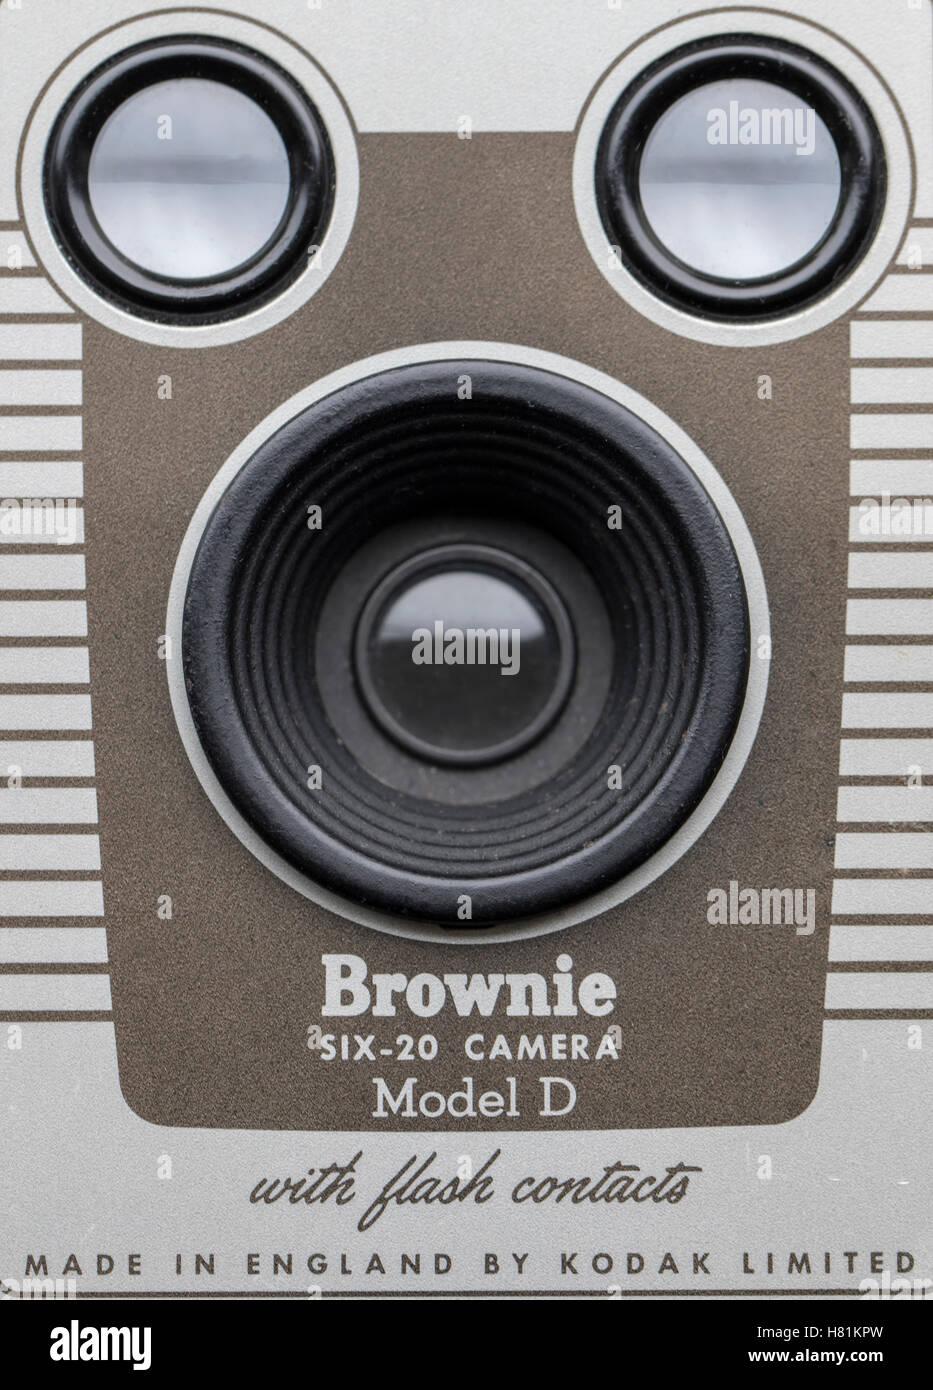 Front of Kodak Brownie 620 vintage camera - Stock Image